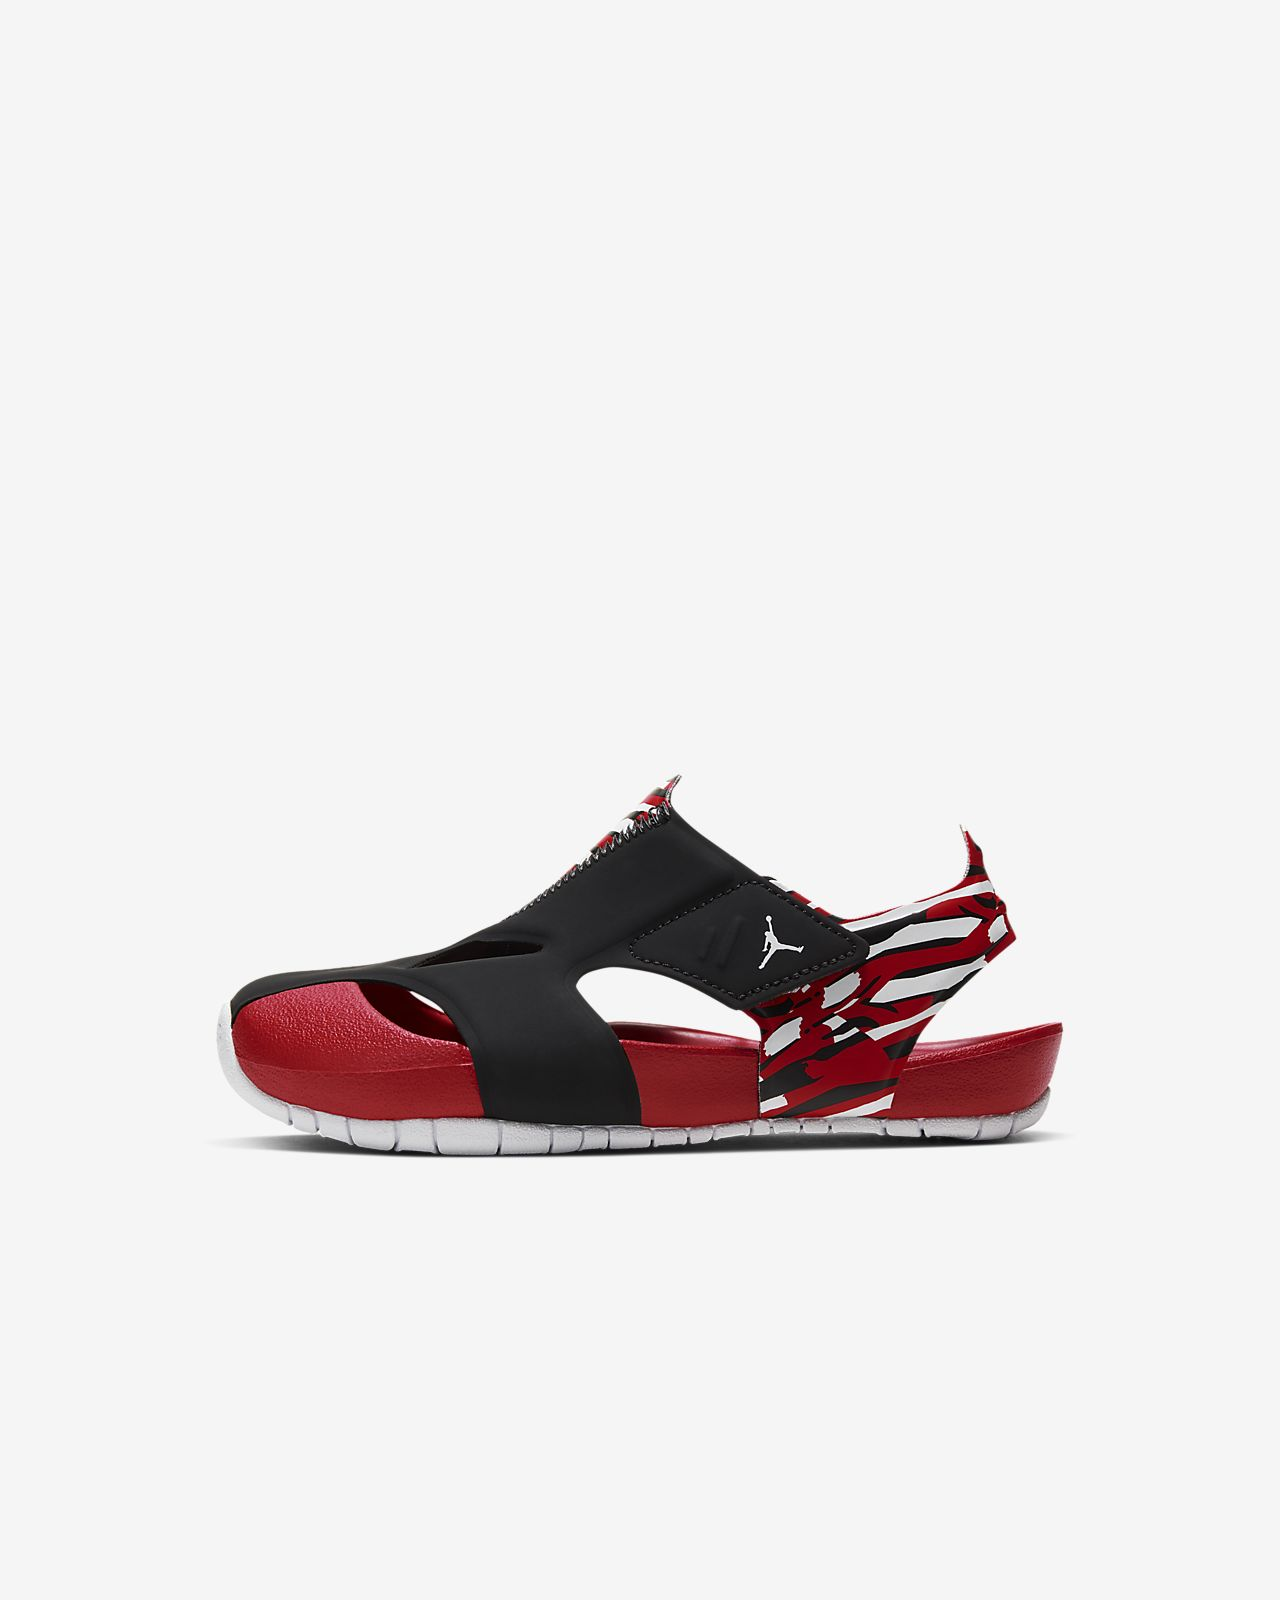 Jordan Flare (PS) 幼童运动童鞋